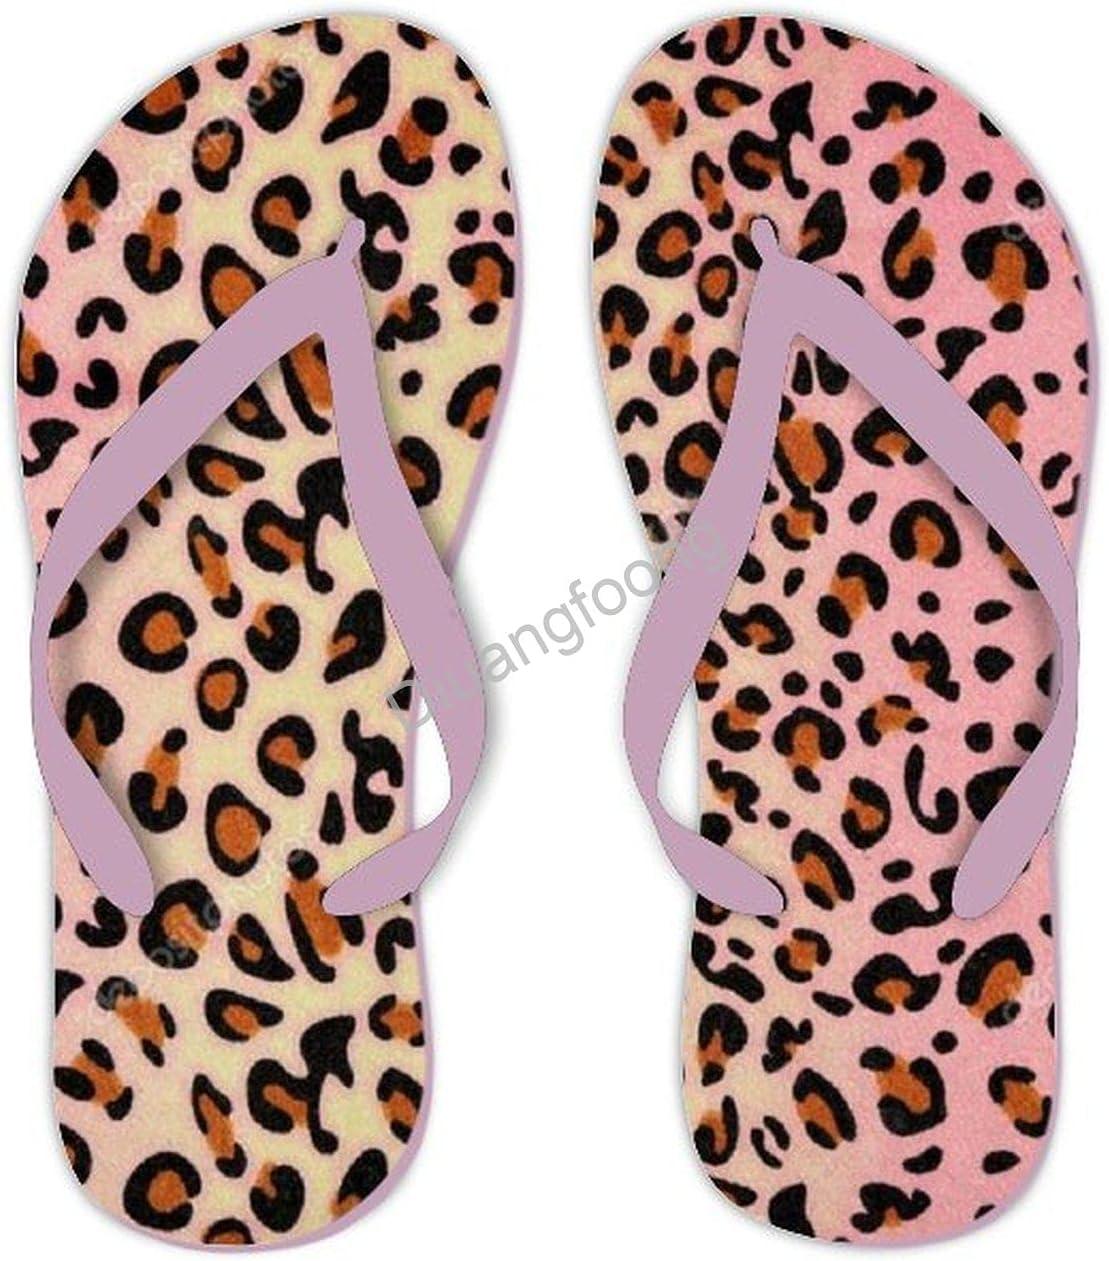 Leopard Flip Flops Designer Print Thong Sandal Fun Sandal For House Bathroom Party Pink Style1